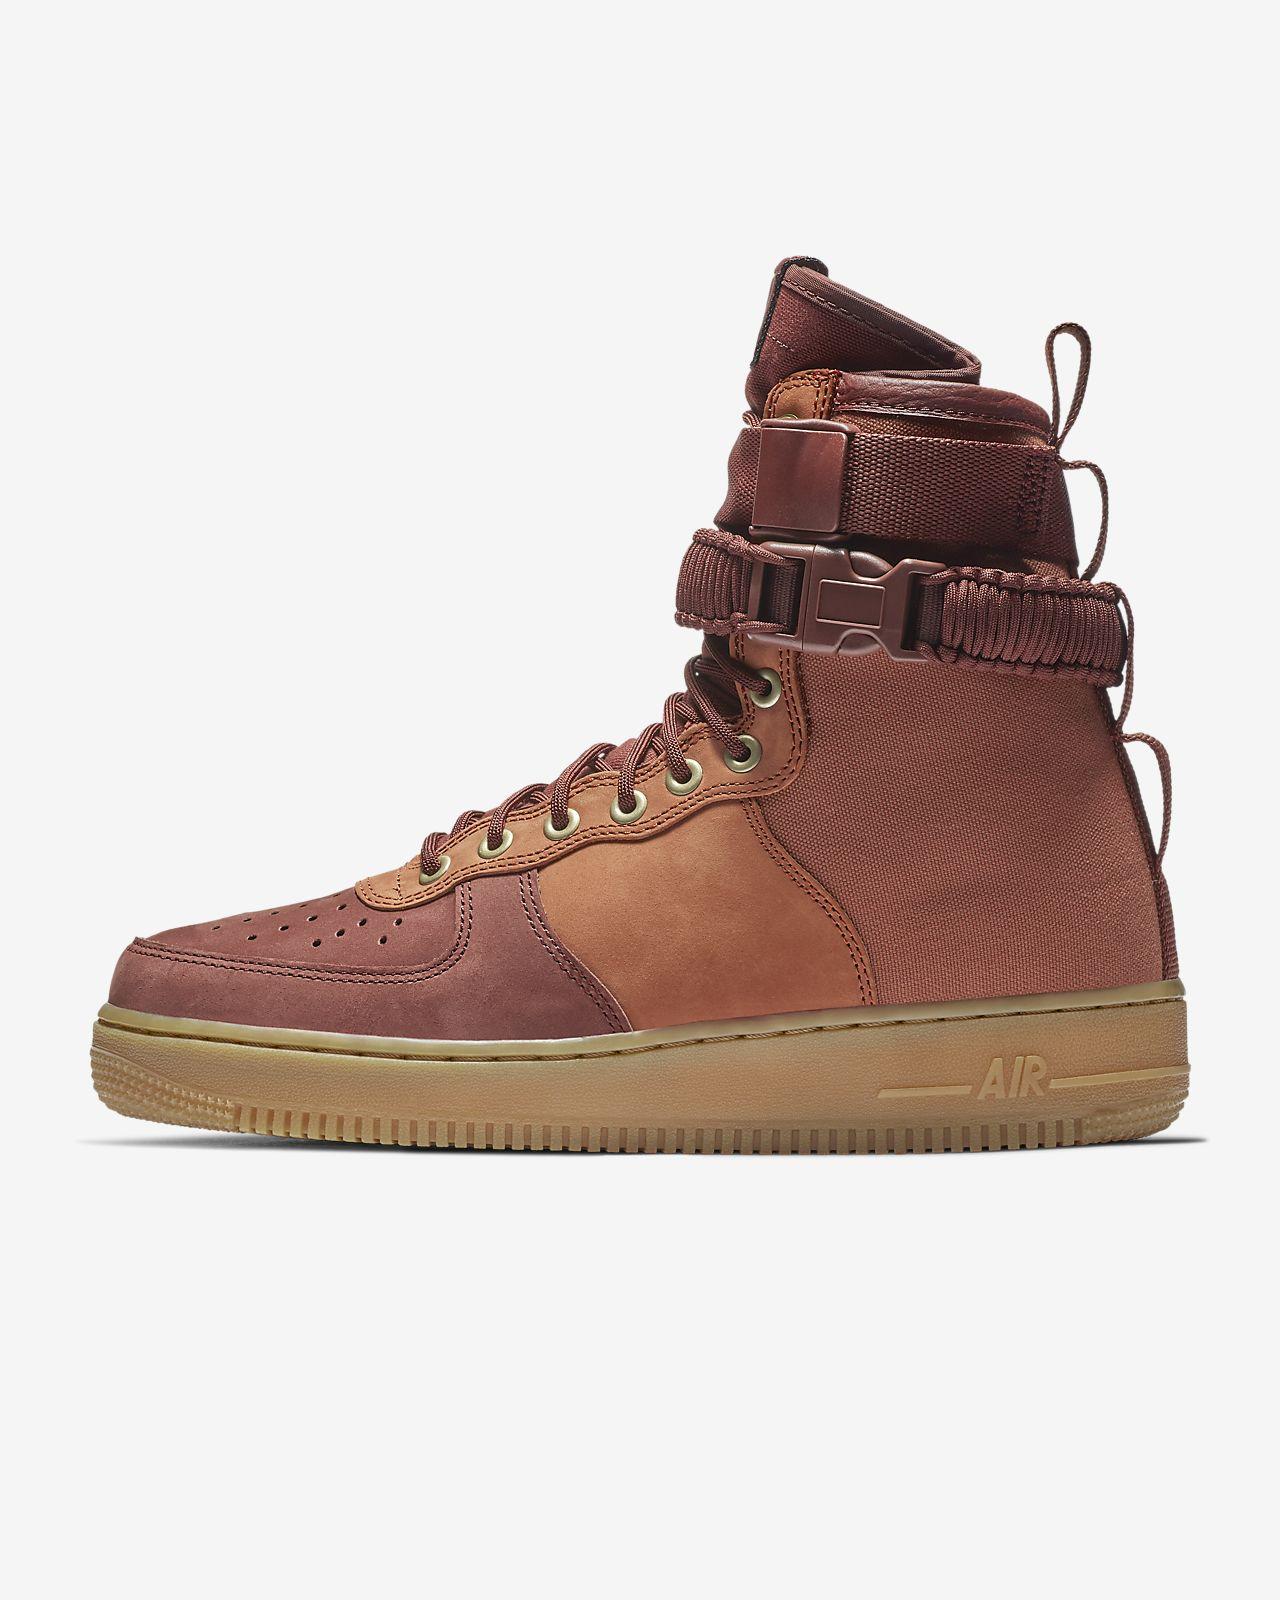 Pour 1 Air Force Chaussure Nike Premium Homme Sf fvYbI67gy